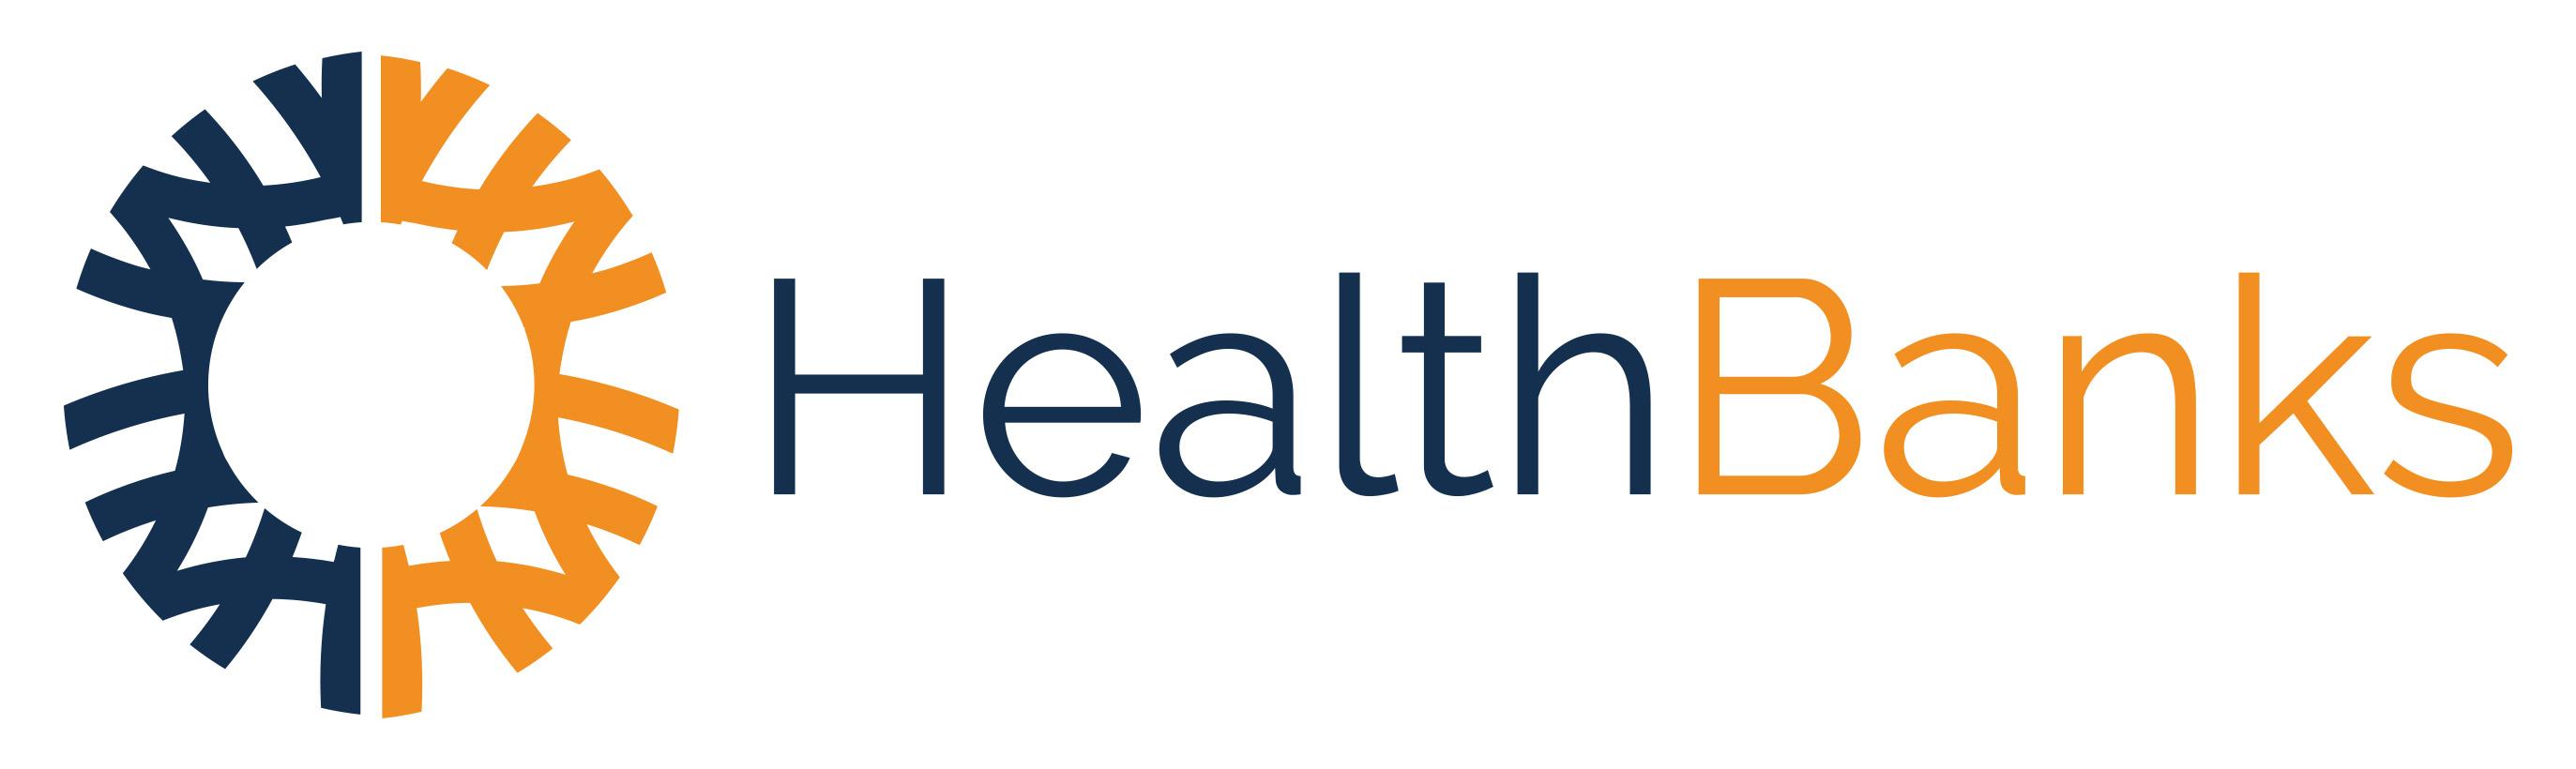 HealthBanks-logo-horiz-color-1